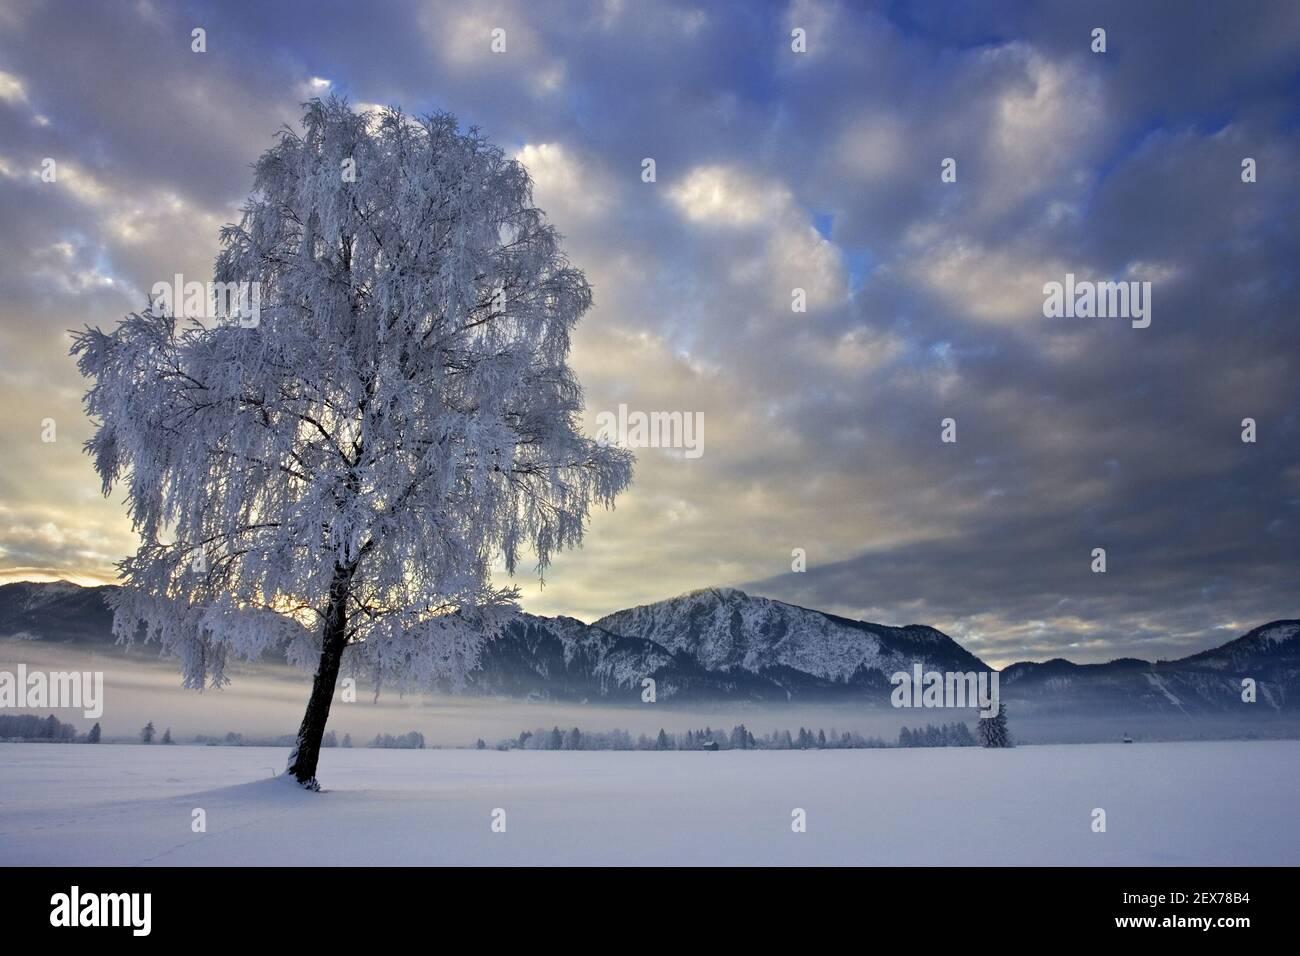 Frostiger und nebliger Sonnenaufgang am Alpenrand, Kochelsee, Bayern starker Raureif in den Bäumen, frostiger und nebliger Sonnenaufgang in der BA Stockfoto